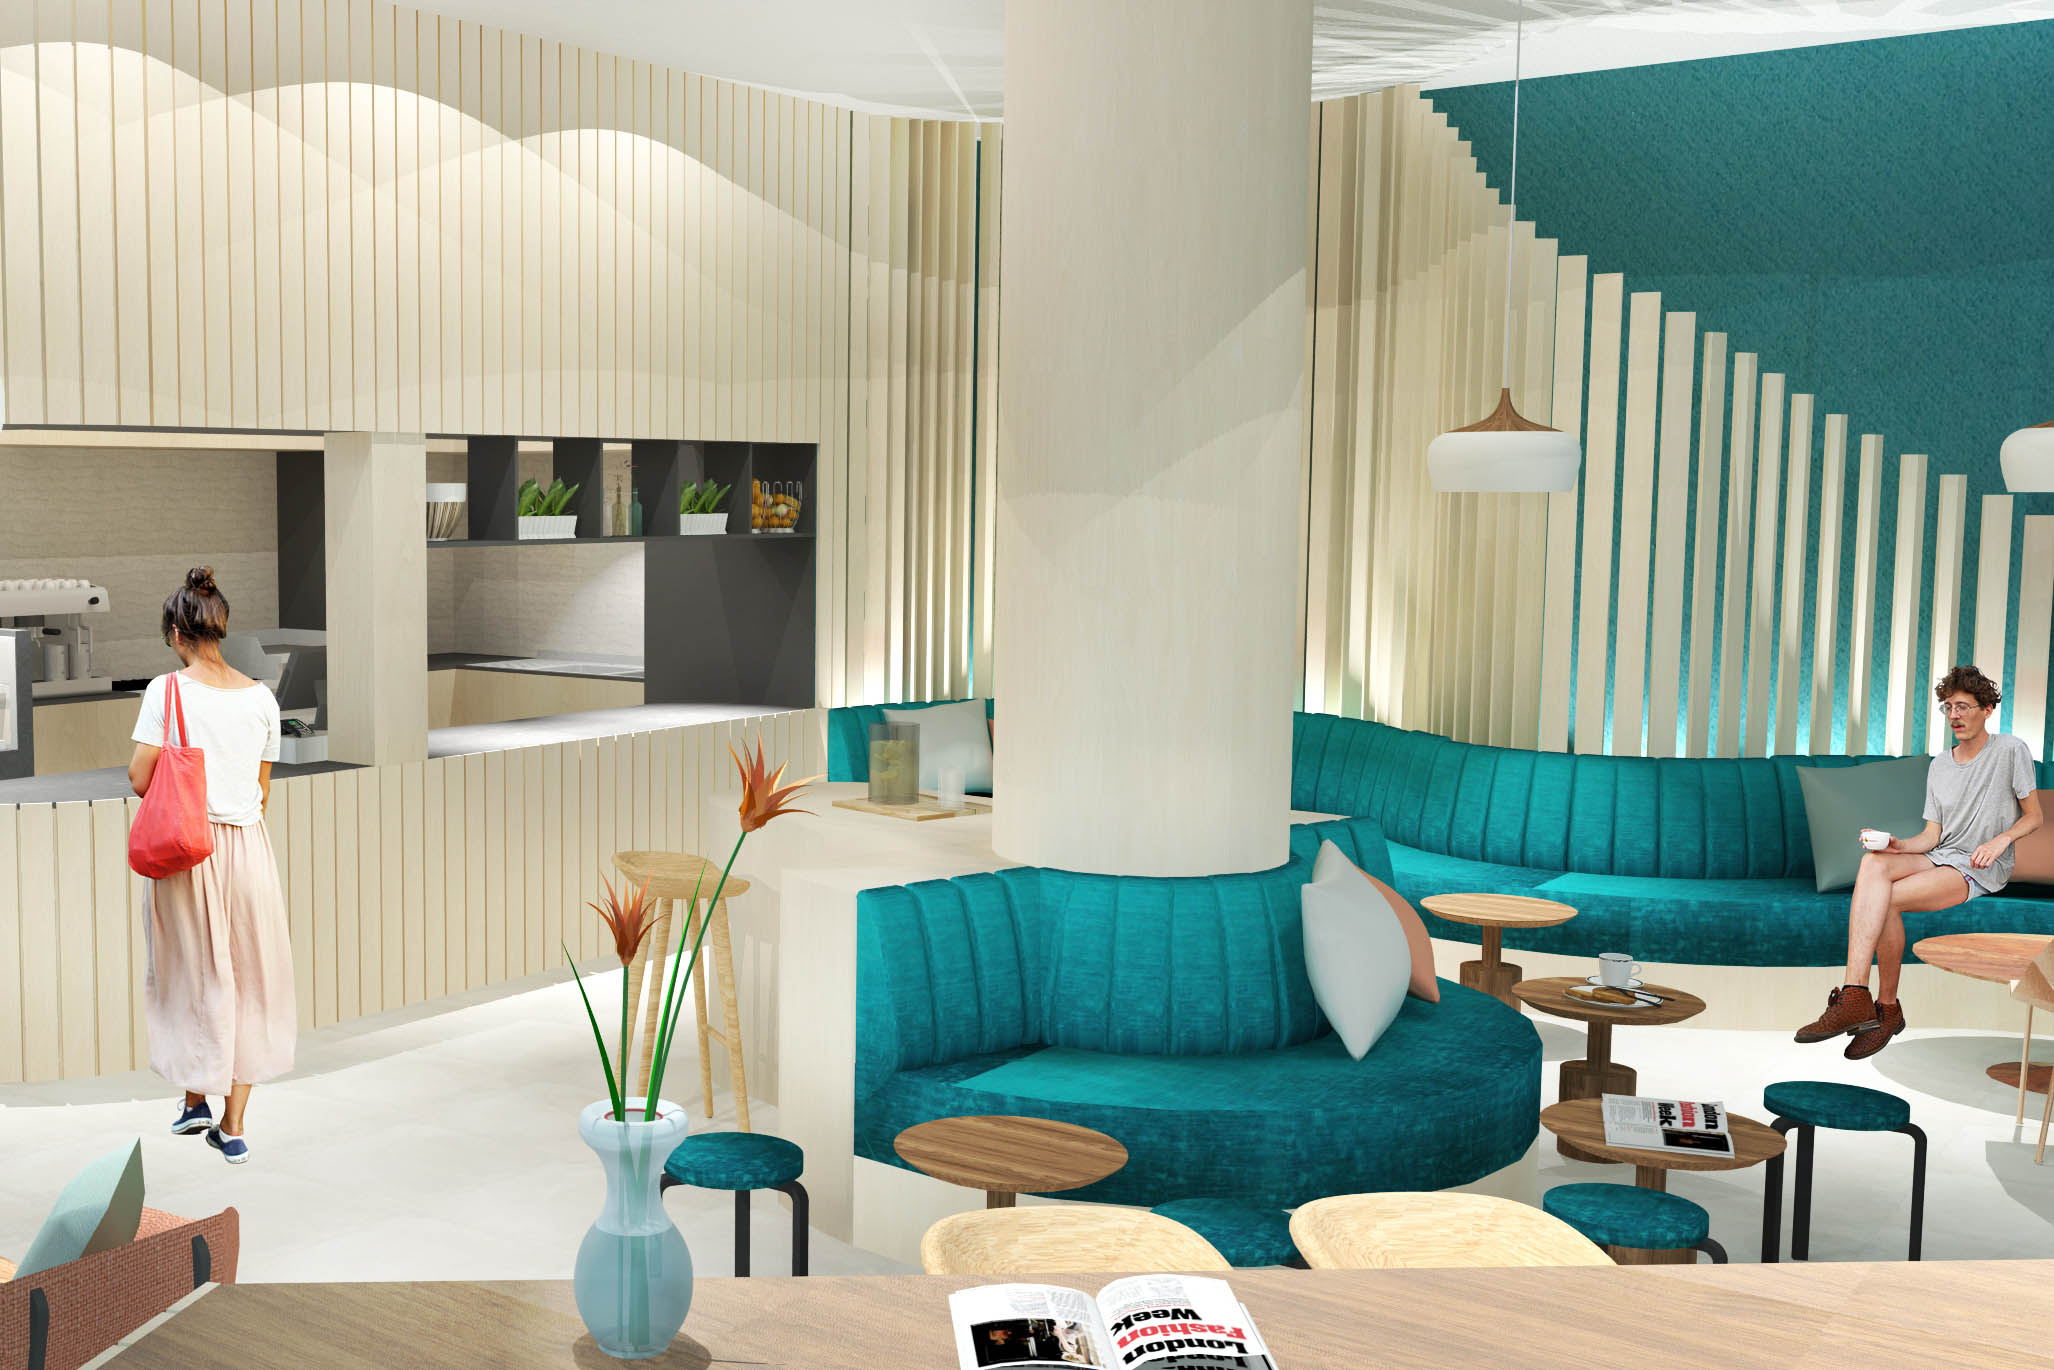 Sydney Design School, SketchUp, Interior Design